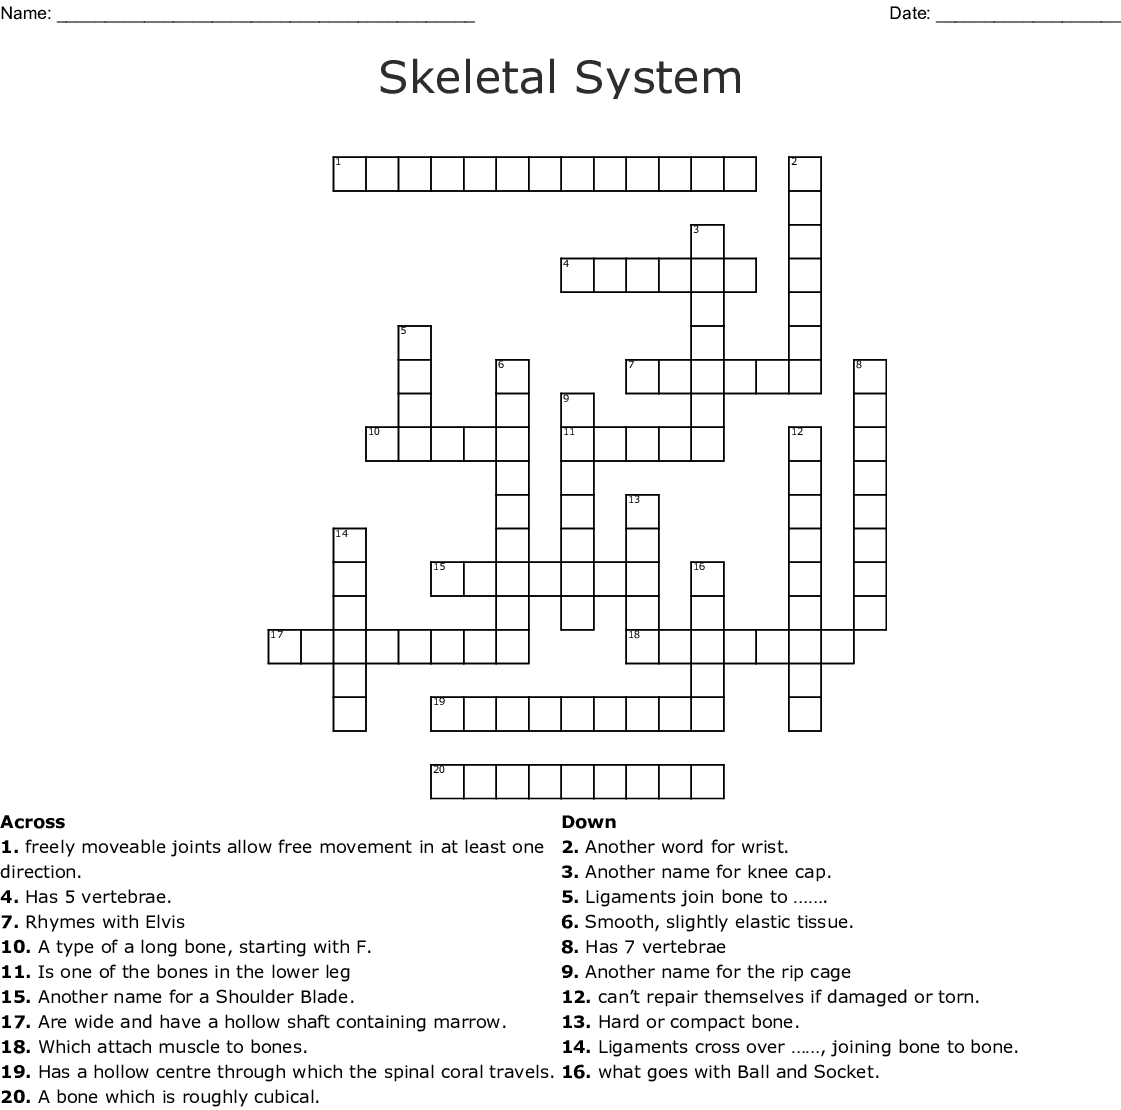 Skeletal System Crossword